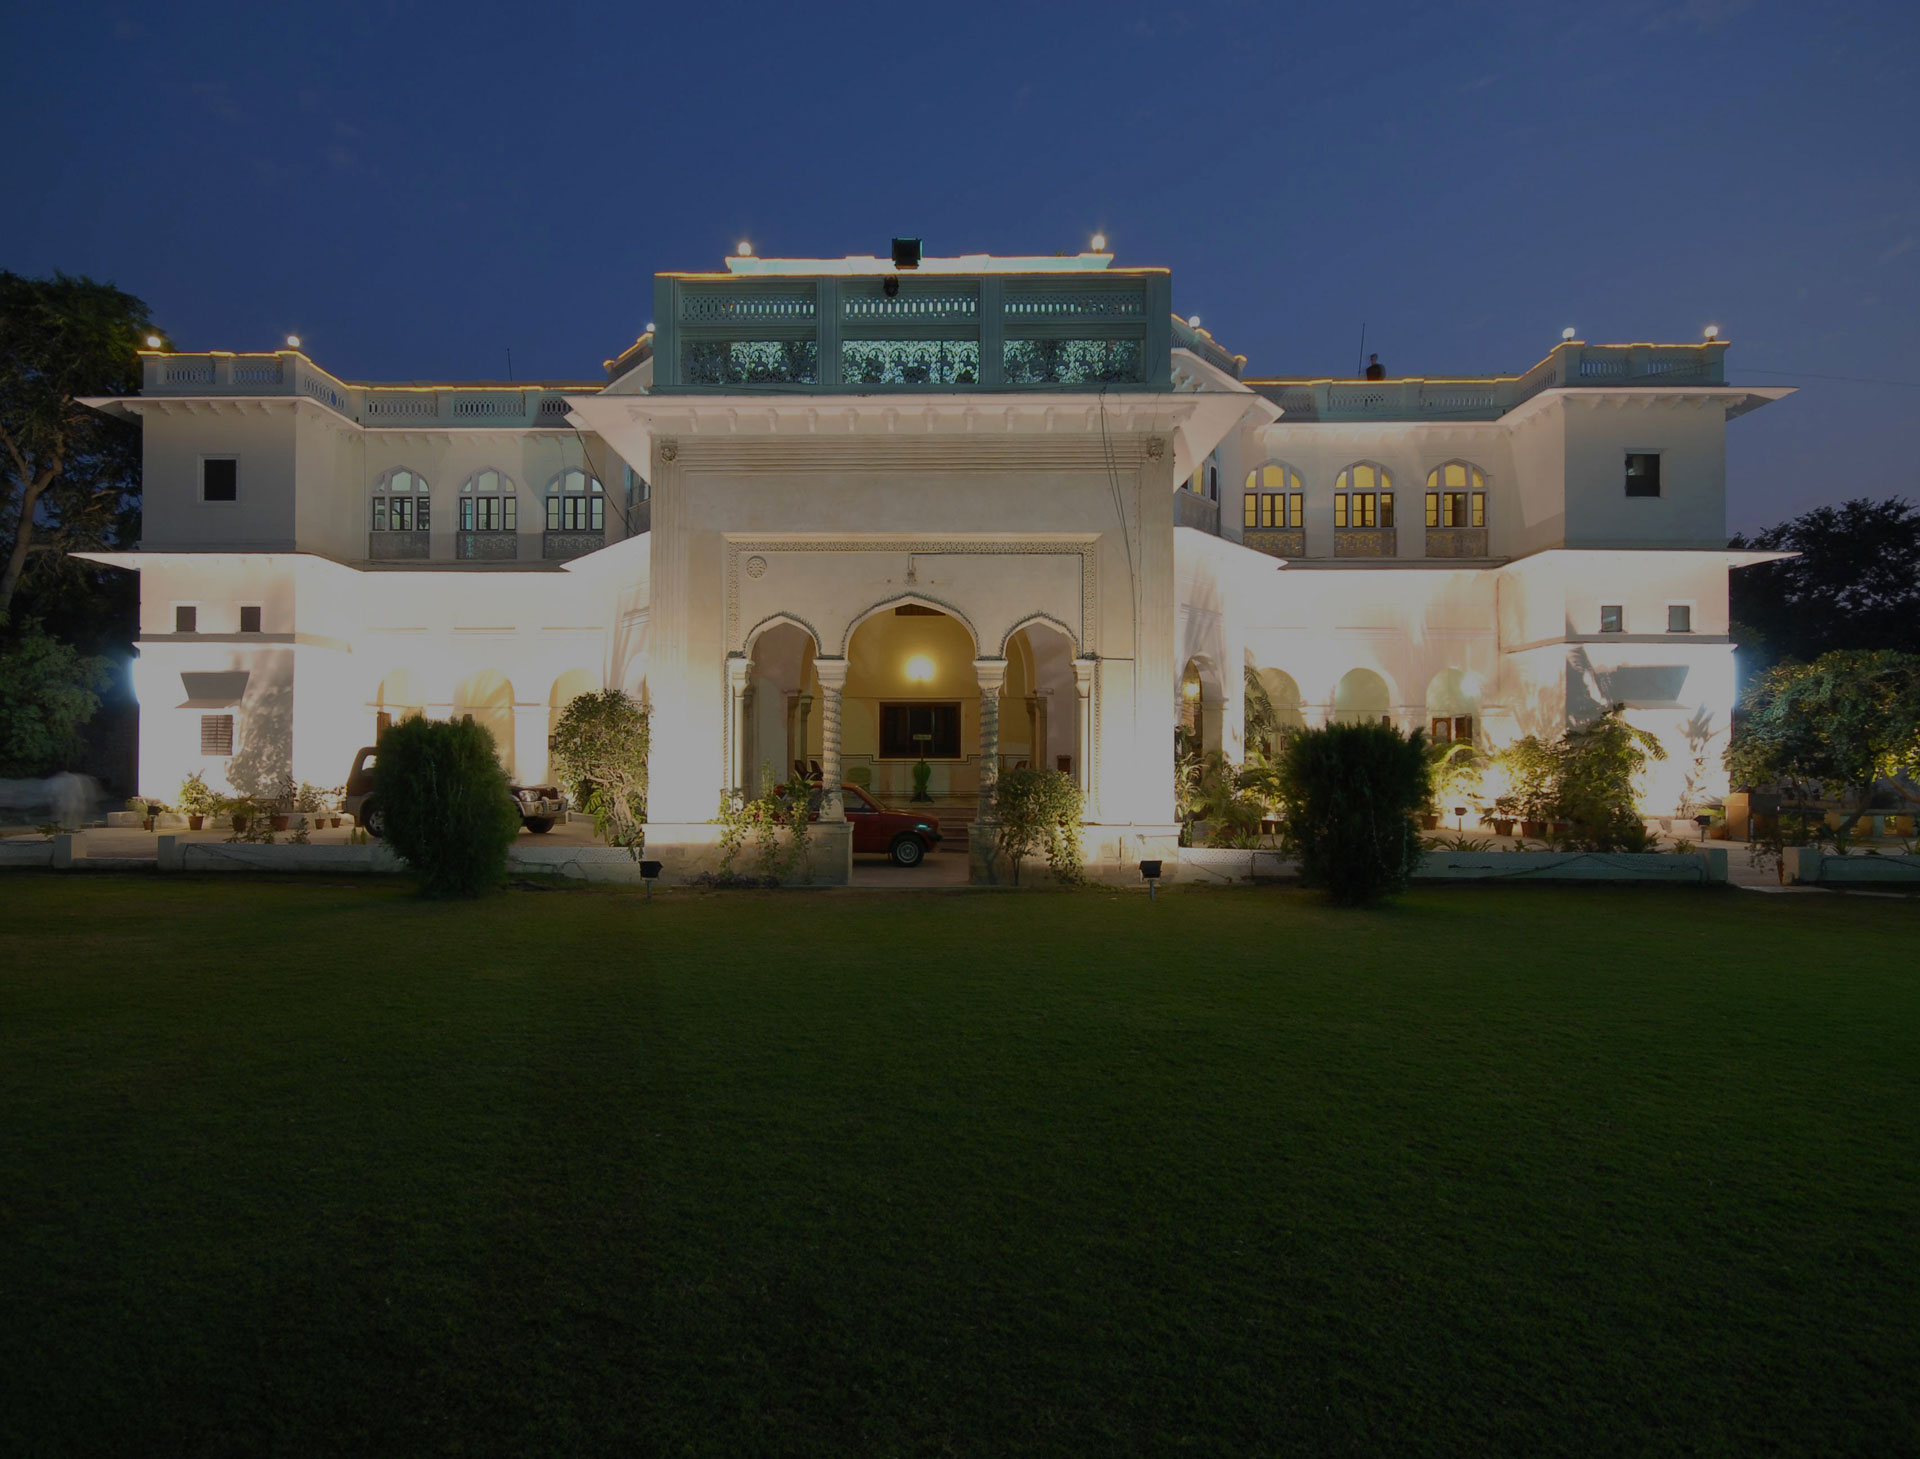 Heritage Hotel in Jaipur, Hotels in Jaipur, Book Hari Mahal Palace Hotel in Jaipur